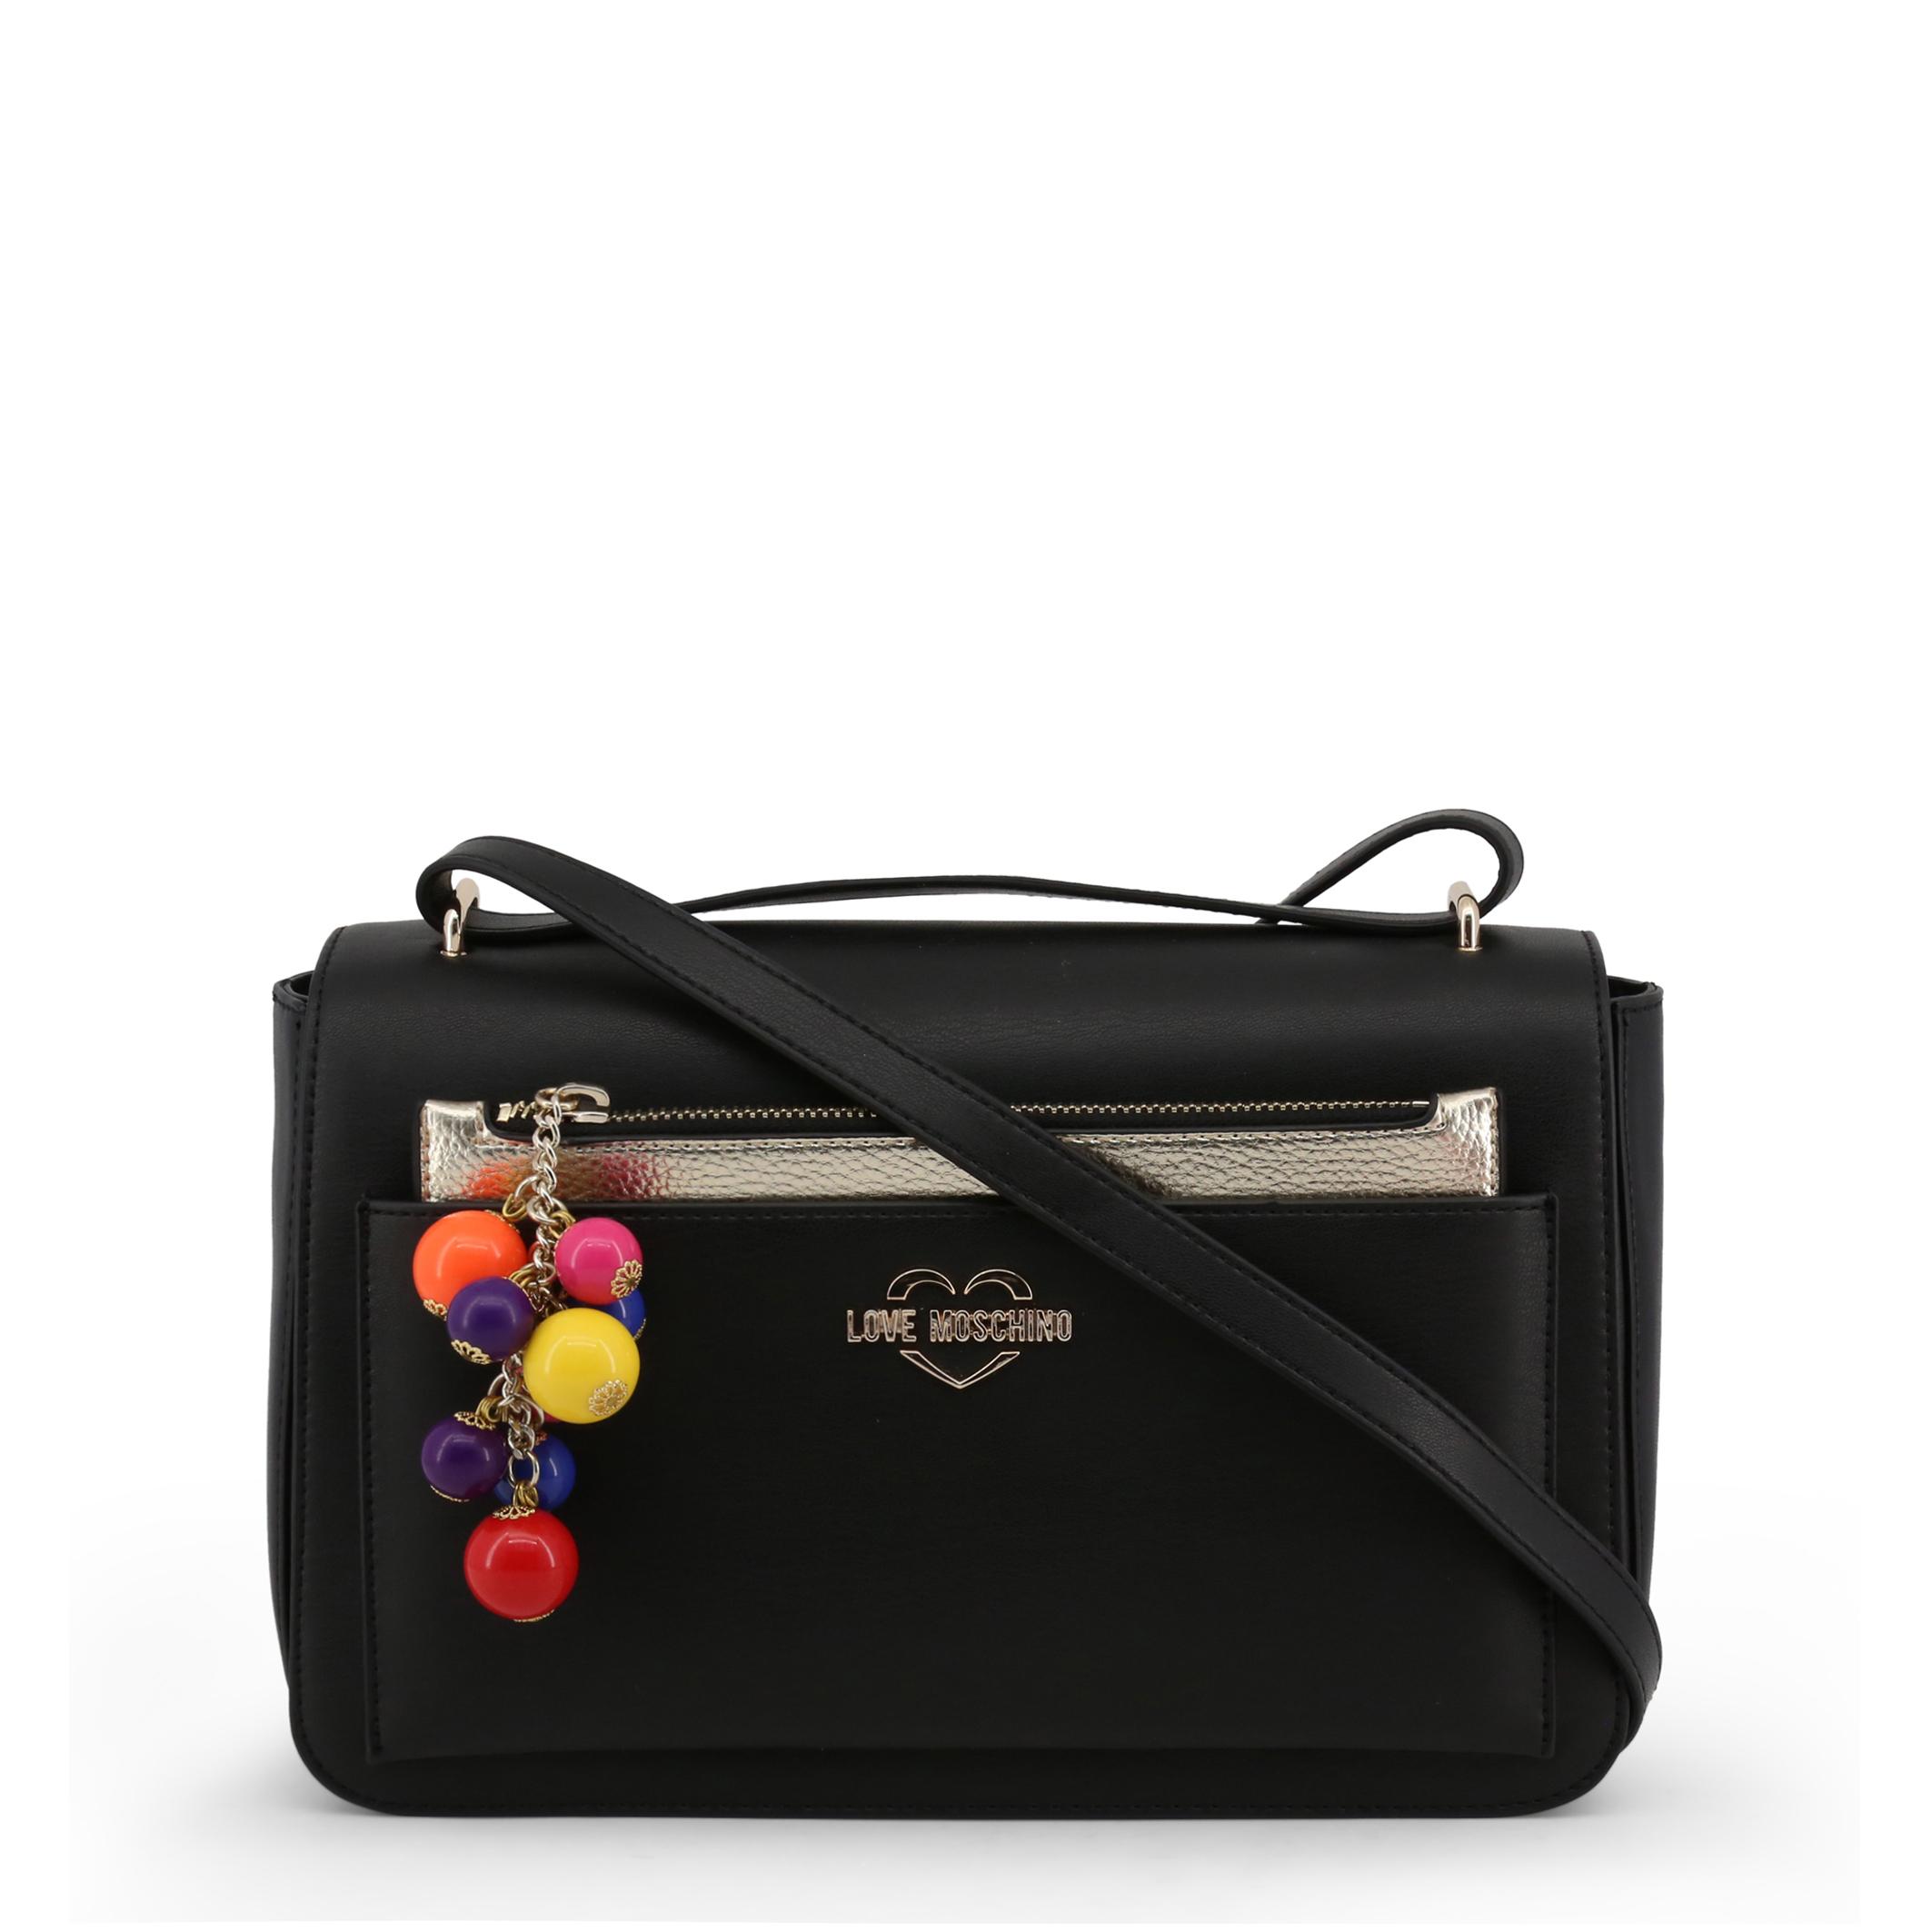 a2295bb664 Love Moschino Womens Crossbody Bag Black 8032698295095   eBay